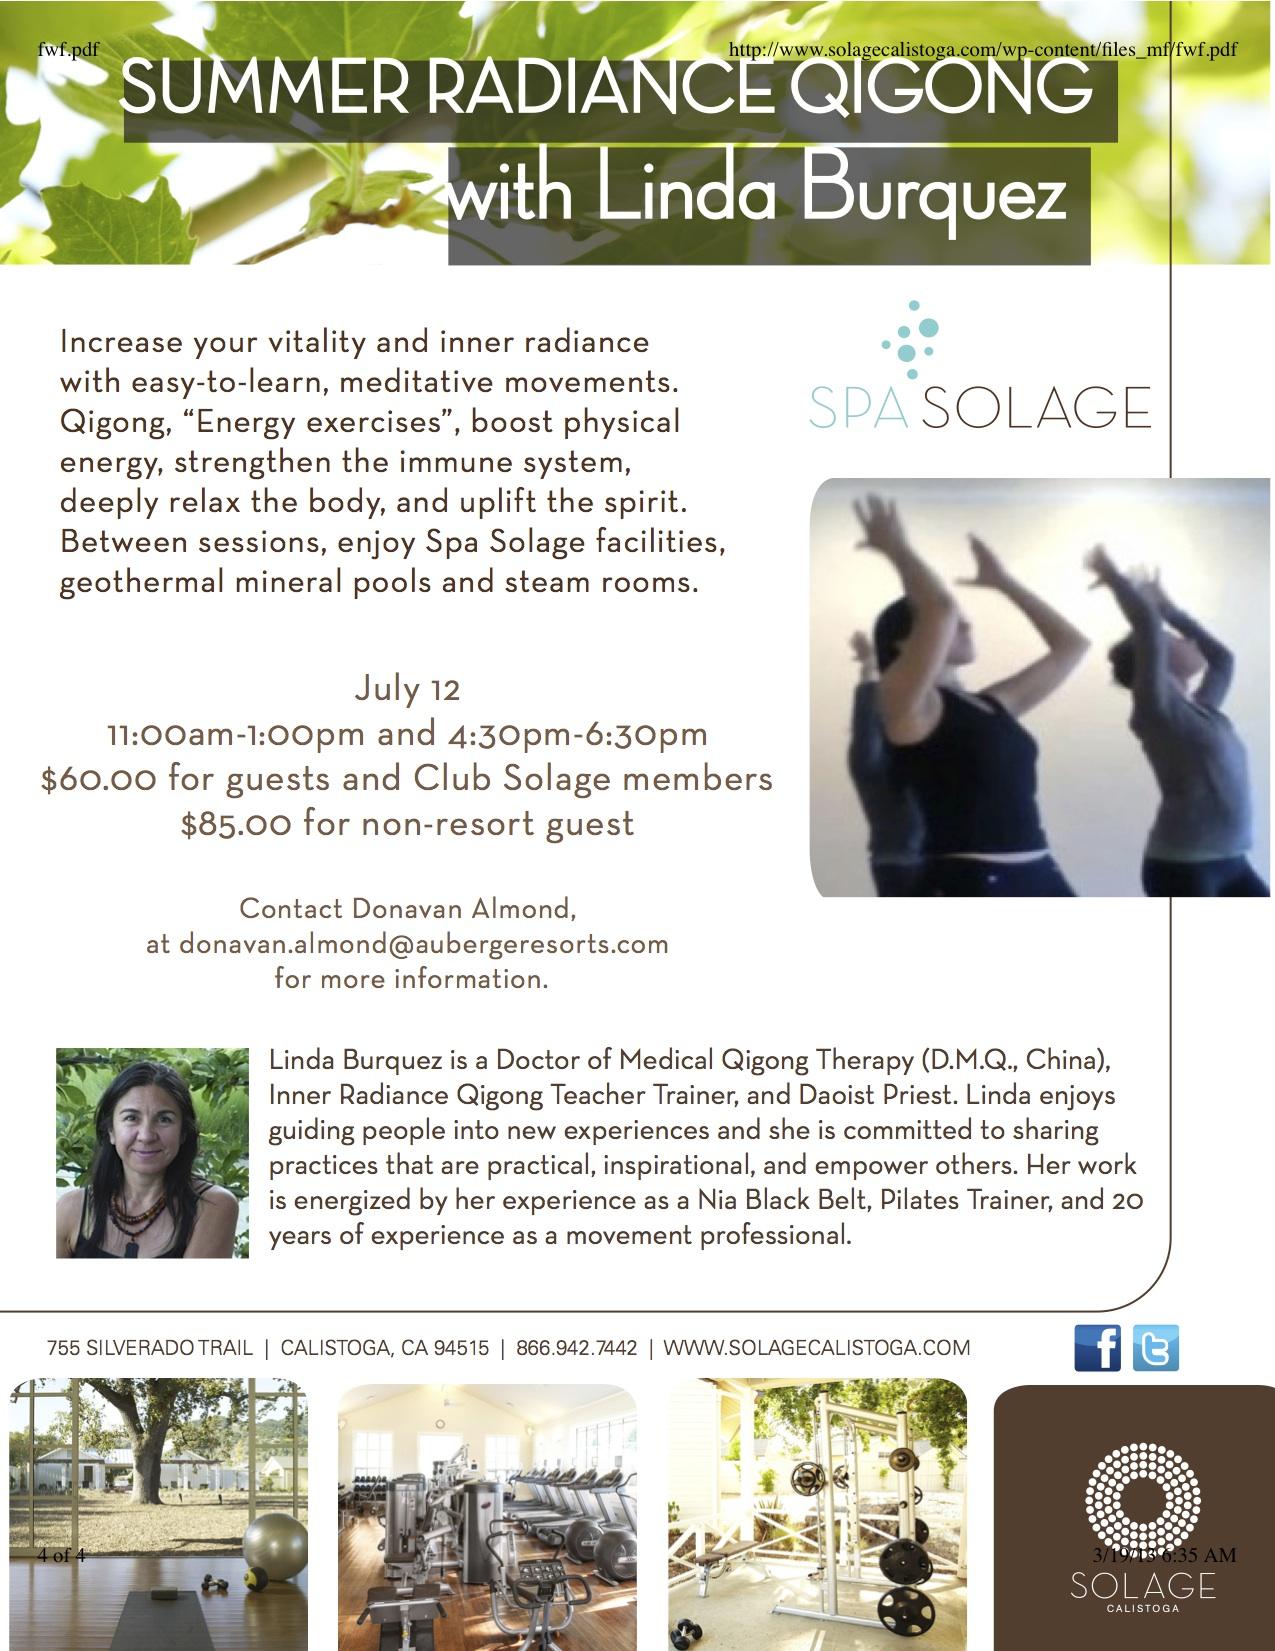 Linda Burquez Qigong Training Spa Solage